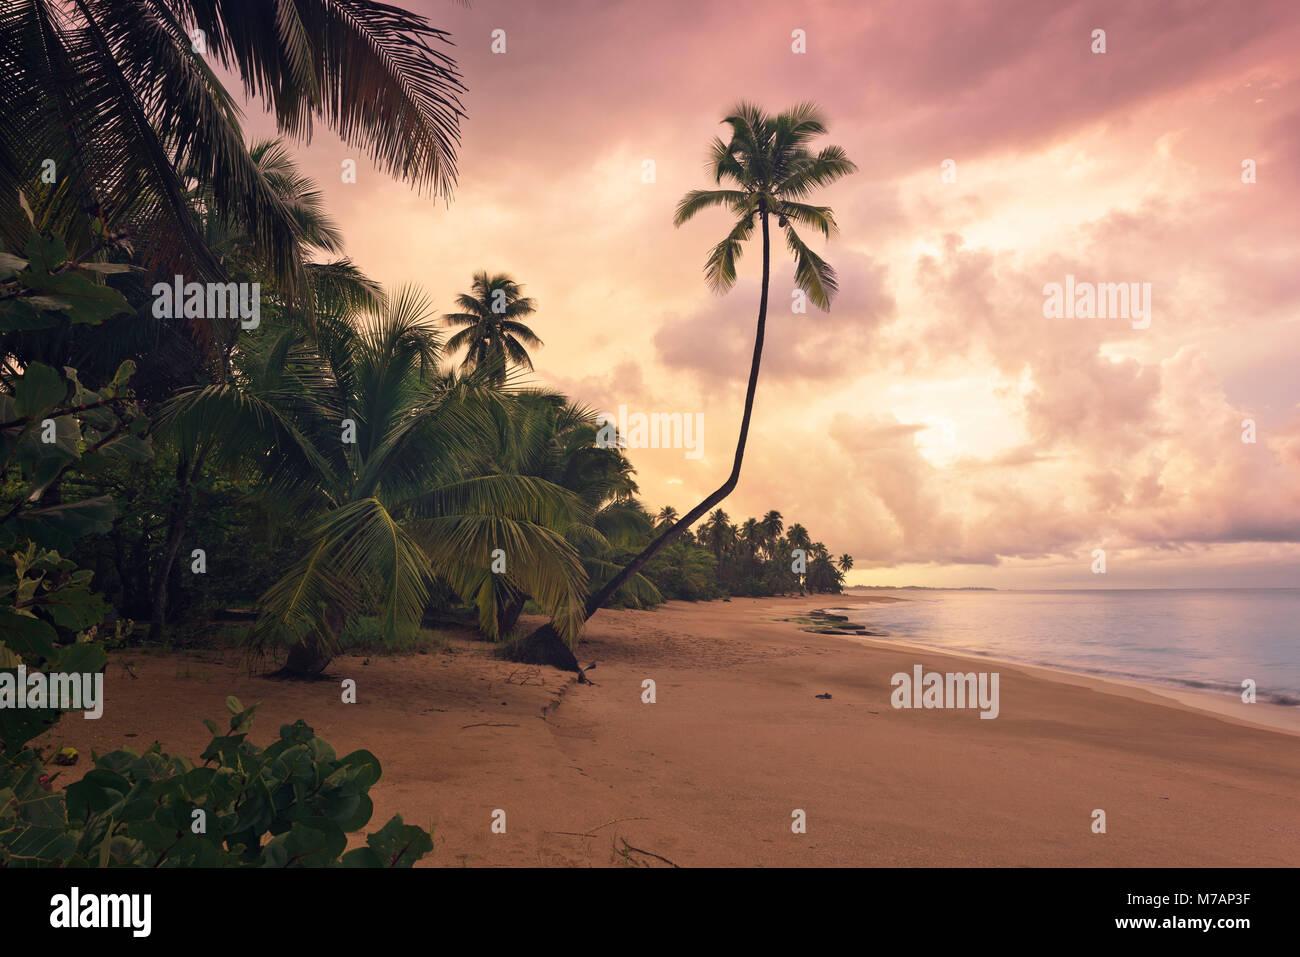 Caribbean dream beach in the sunset, Punta Vacia, Puerto Rico - Stock Image